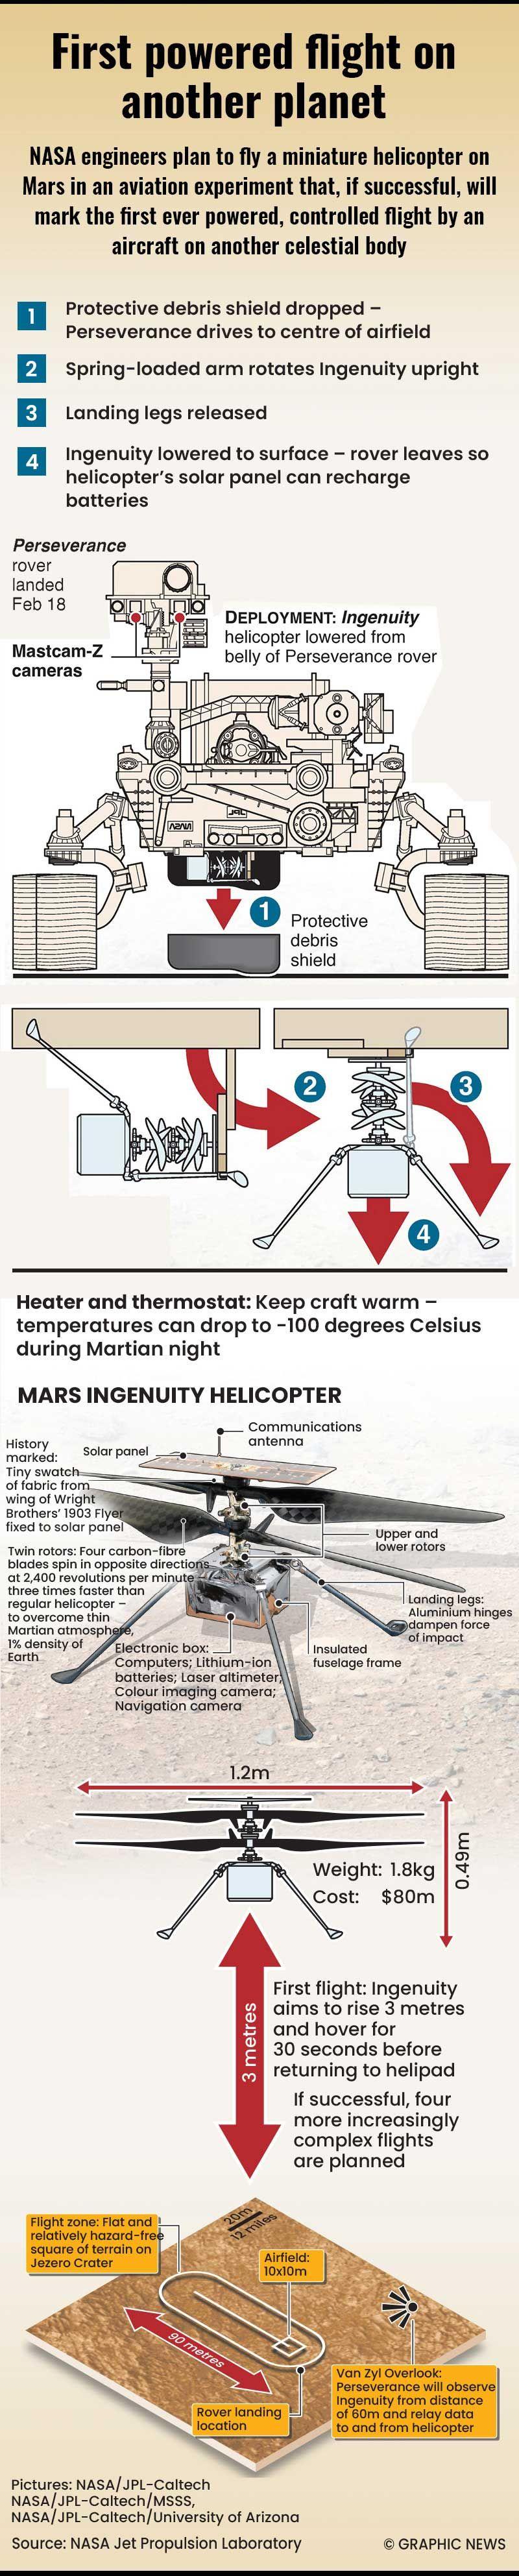 20210331 mars ingenuity